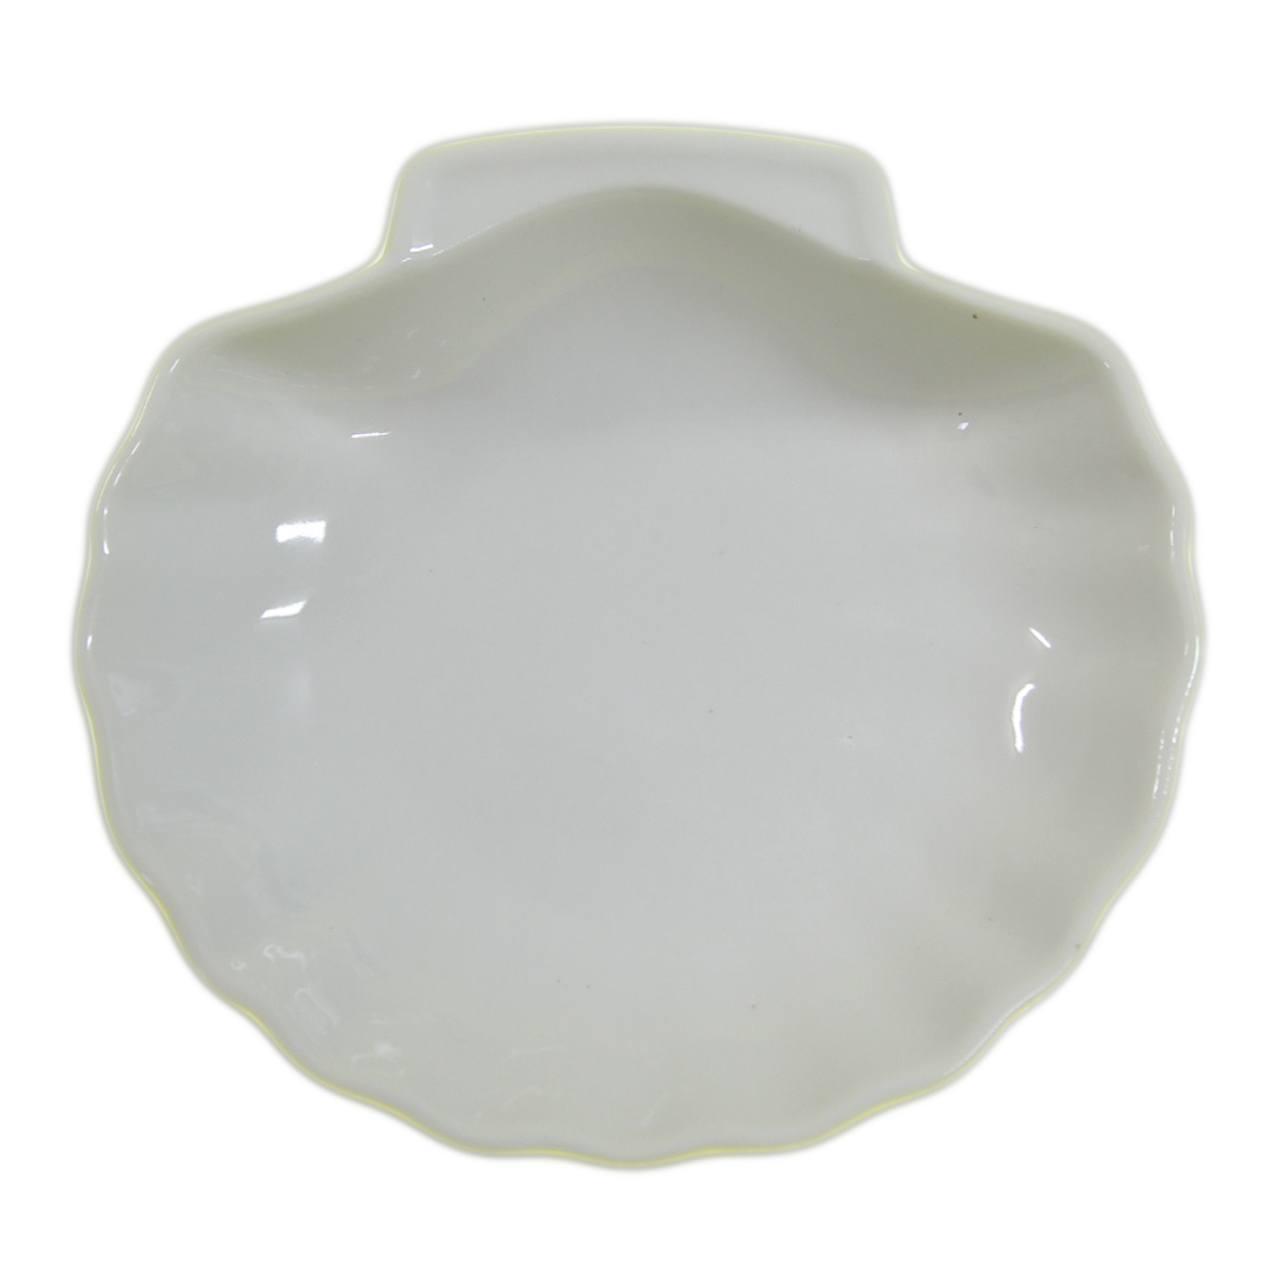 Porta anéis cerâmica Shell Basics Branco 15x14cm Urban